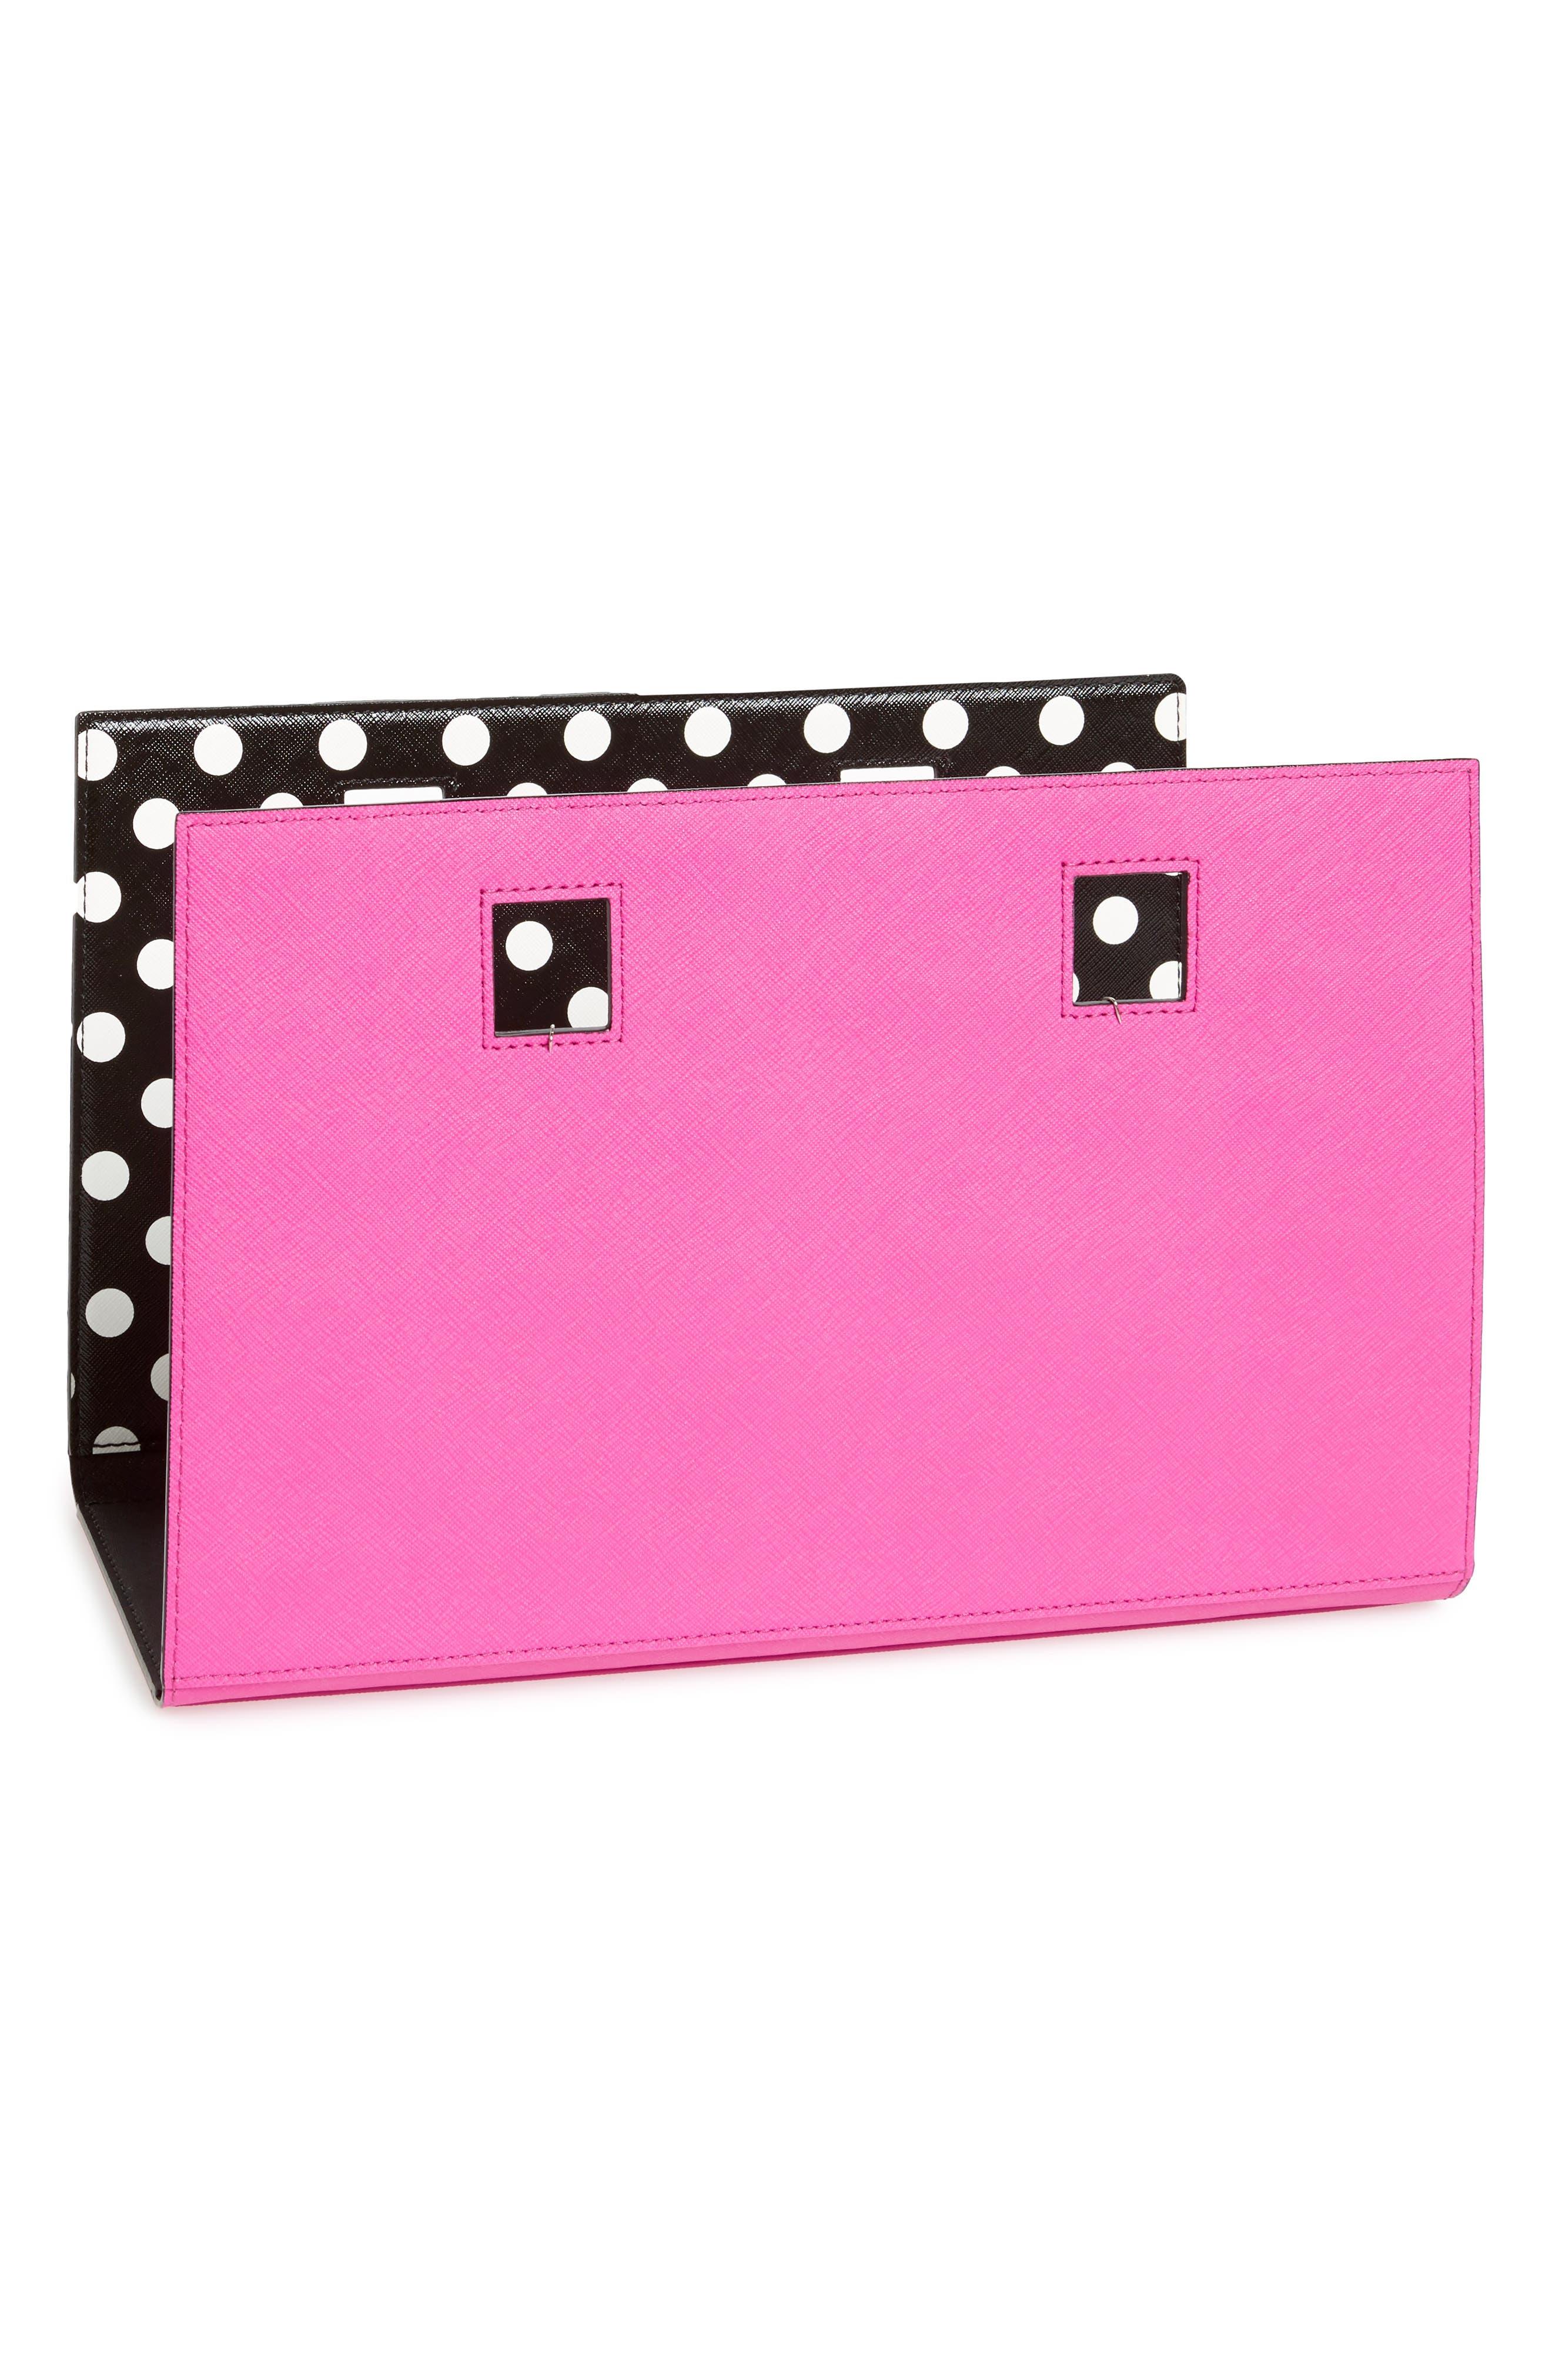 make it mine reversible polka dot/solid leather snap-on accent flap,                             Alternate thumbnail 2, color,                             Blk/ Vivdsn